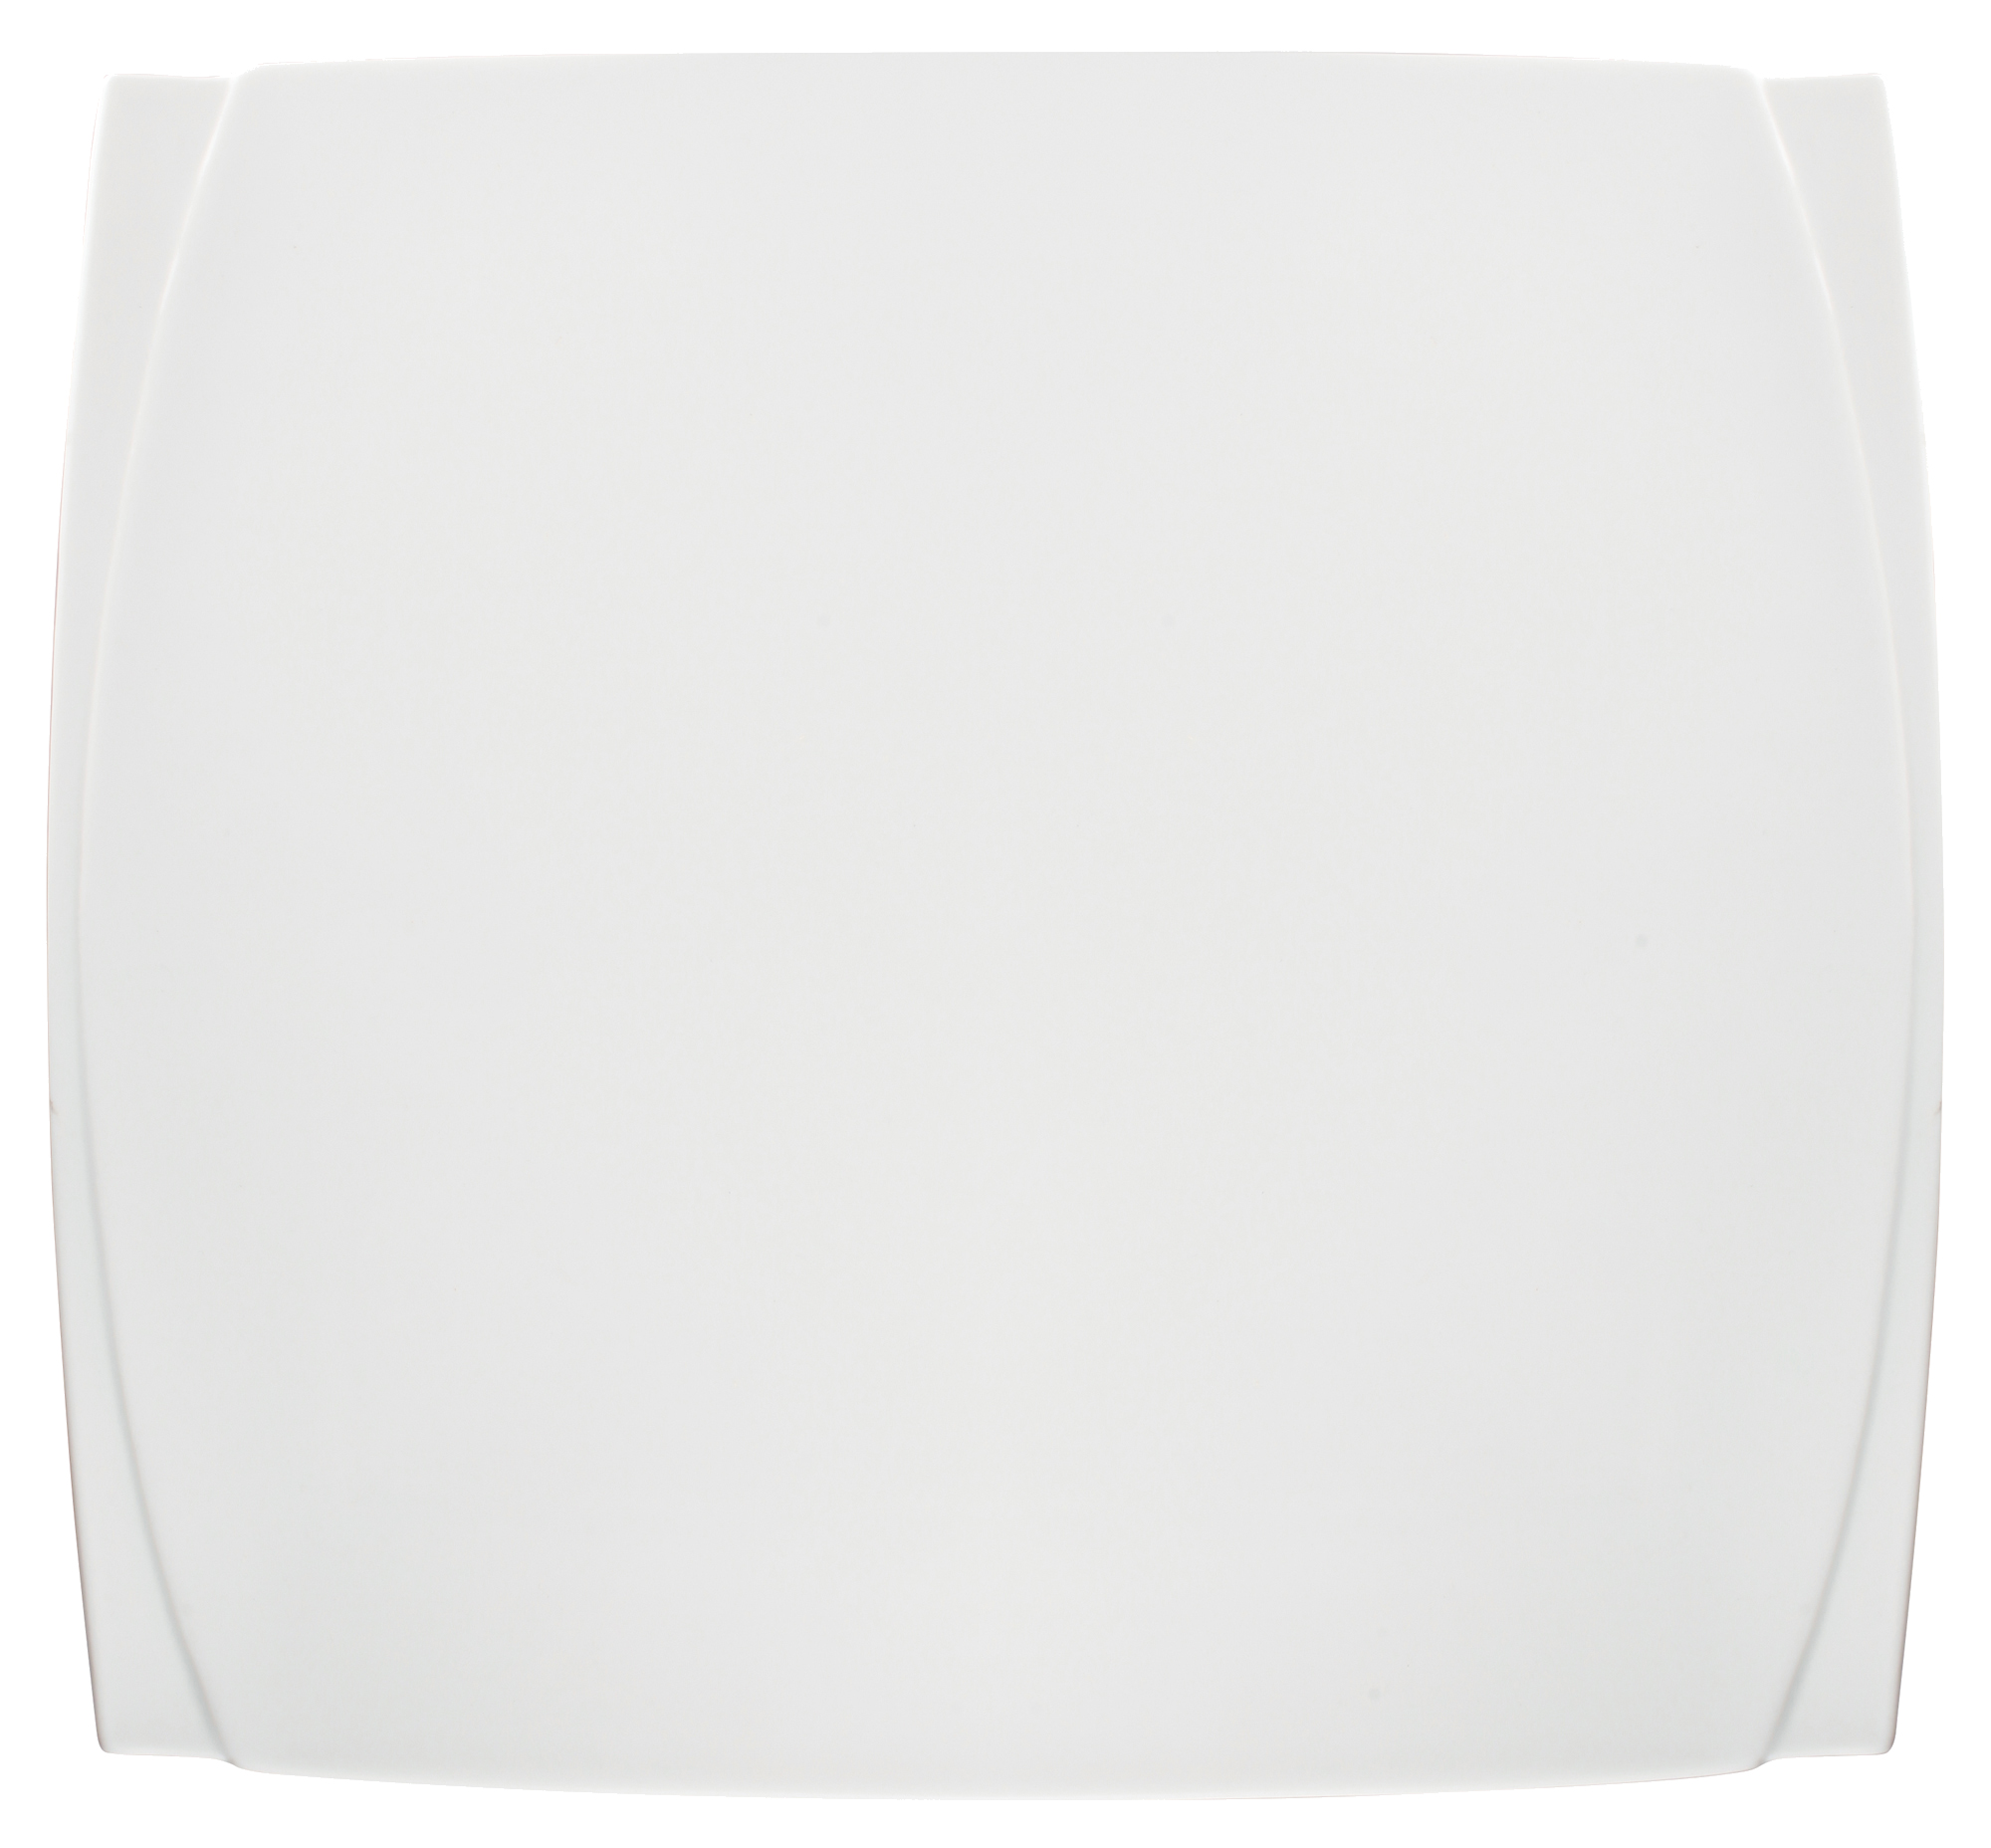 Winco WDP009-101 plate, china